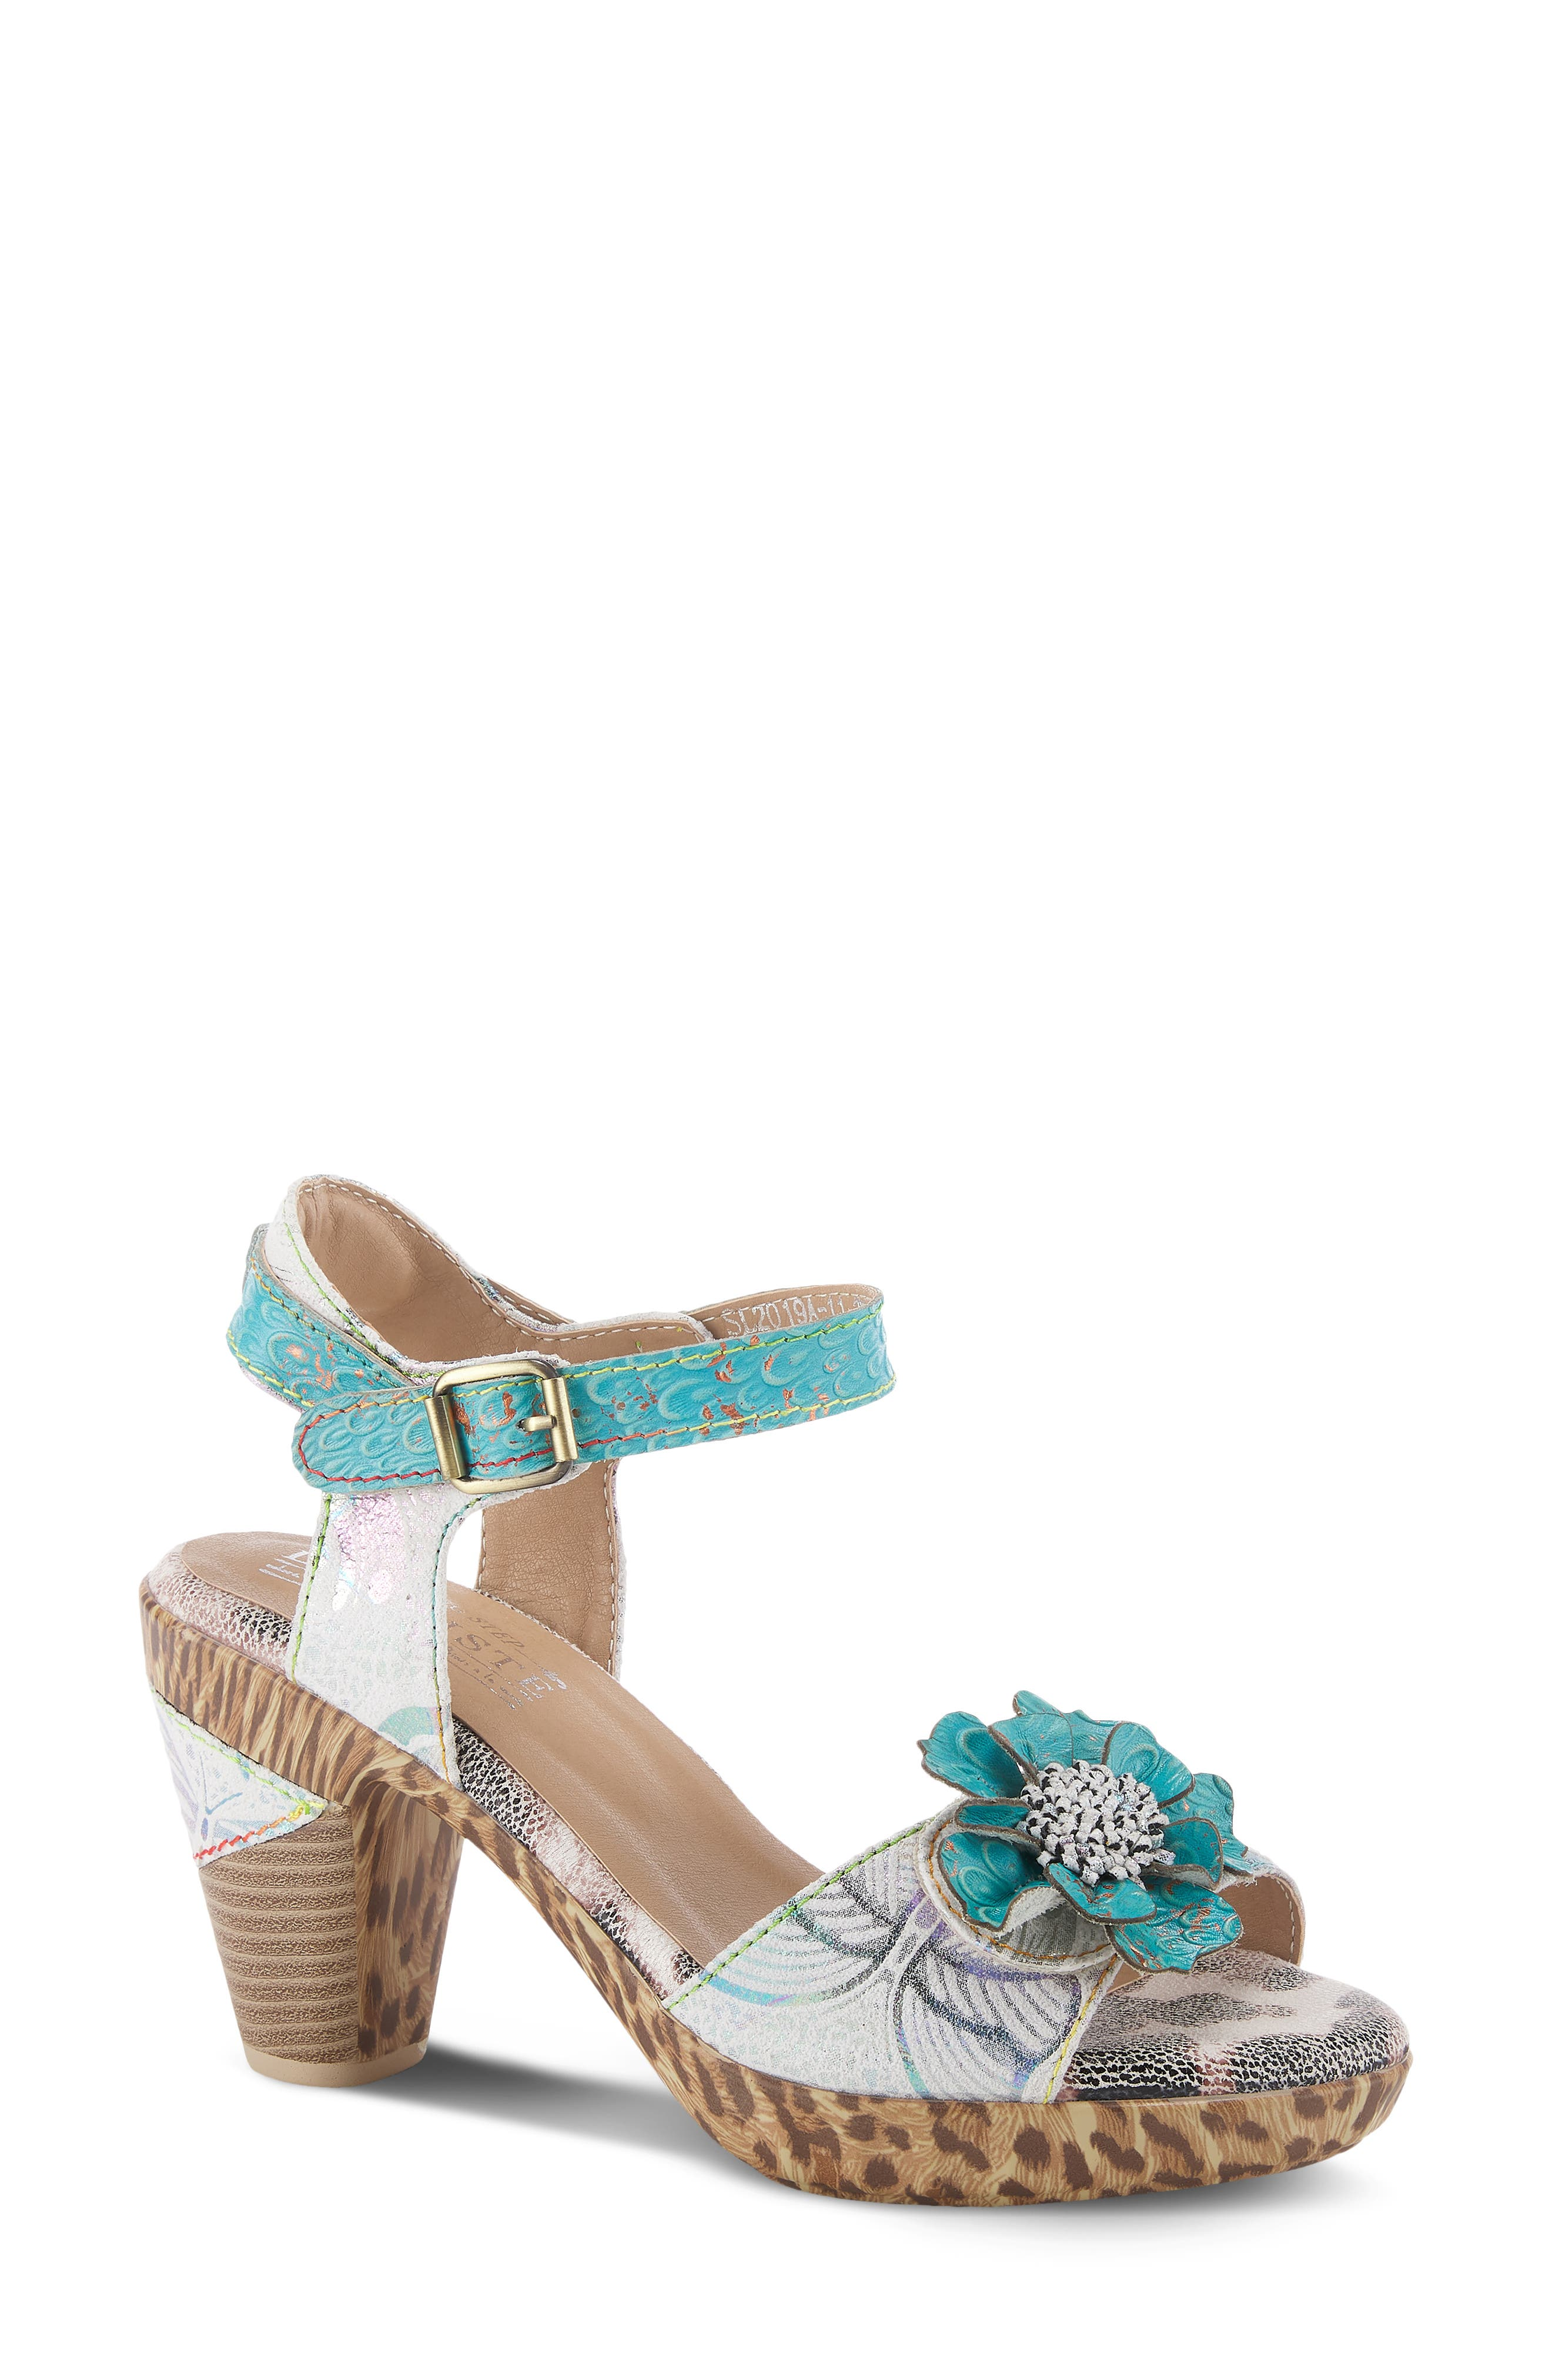 Wildcat Ankle Strap Sandal